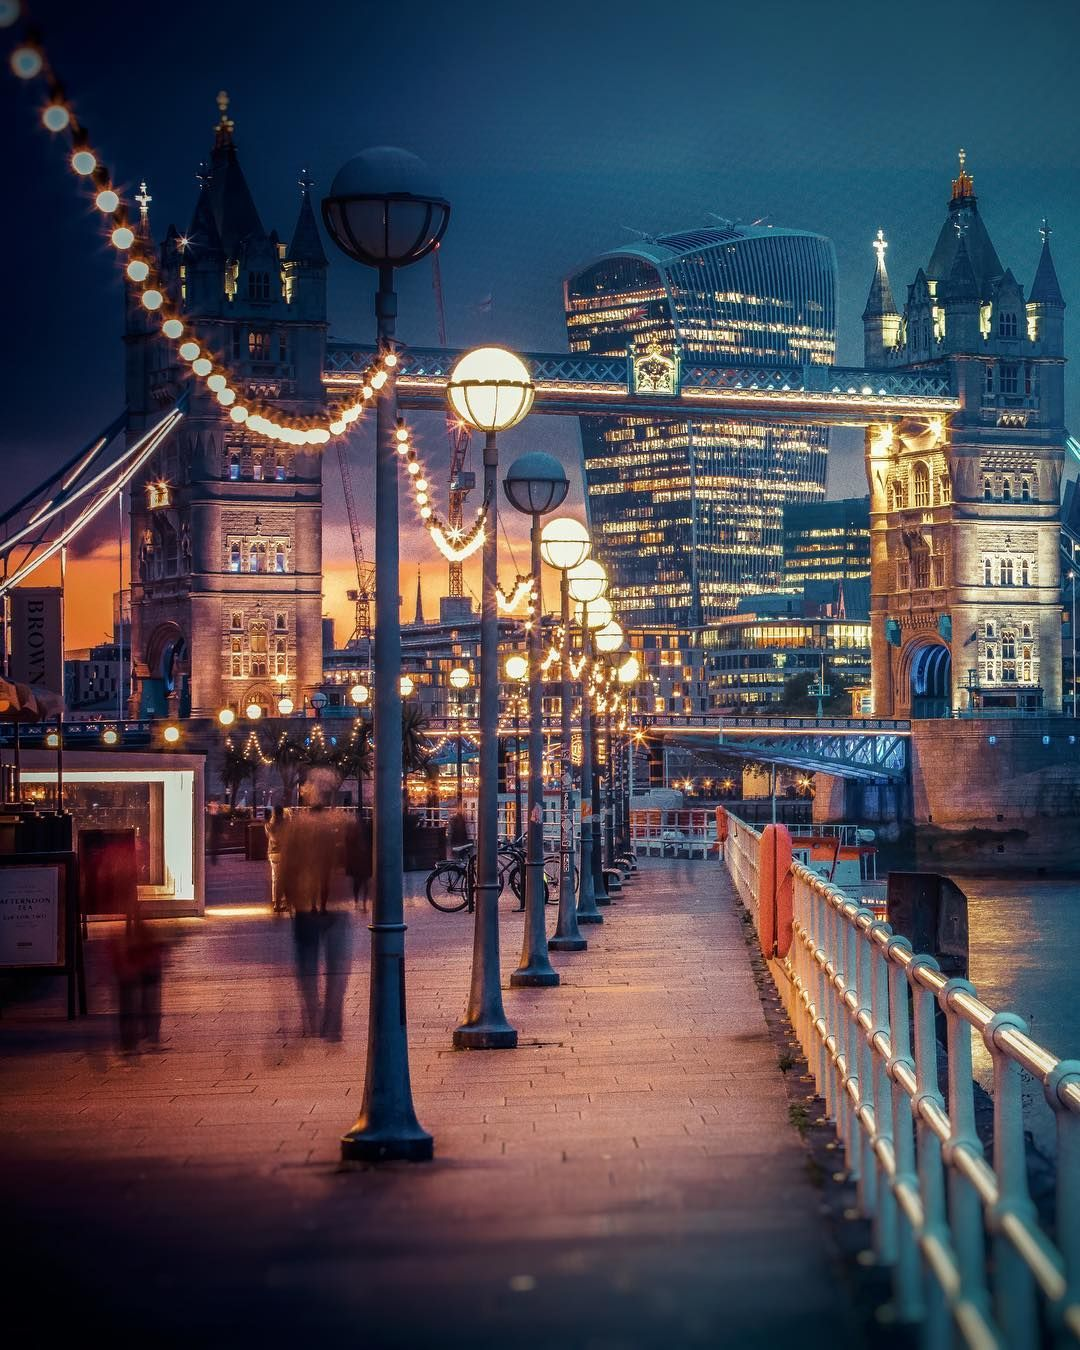 Tower Bridge Tower Hamlets London Travel London Night London Photos Tower bridge night reflections london hd